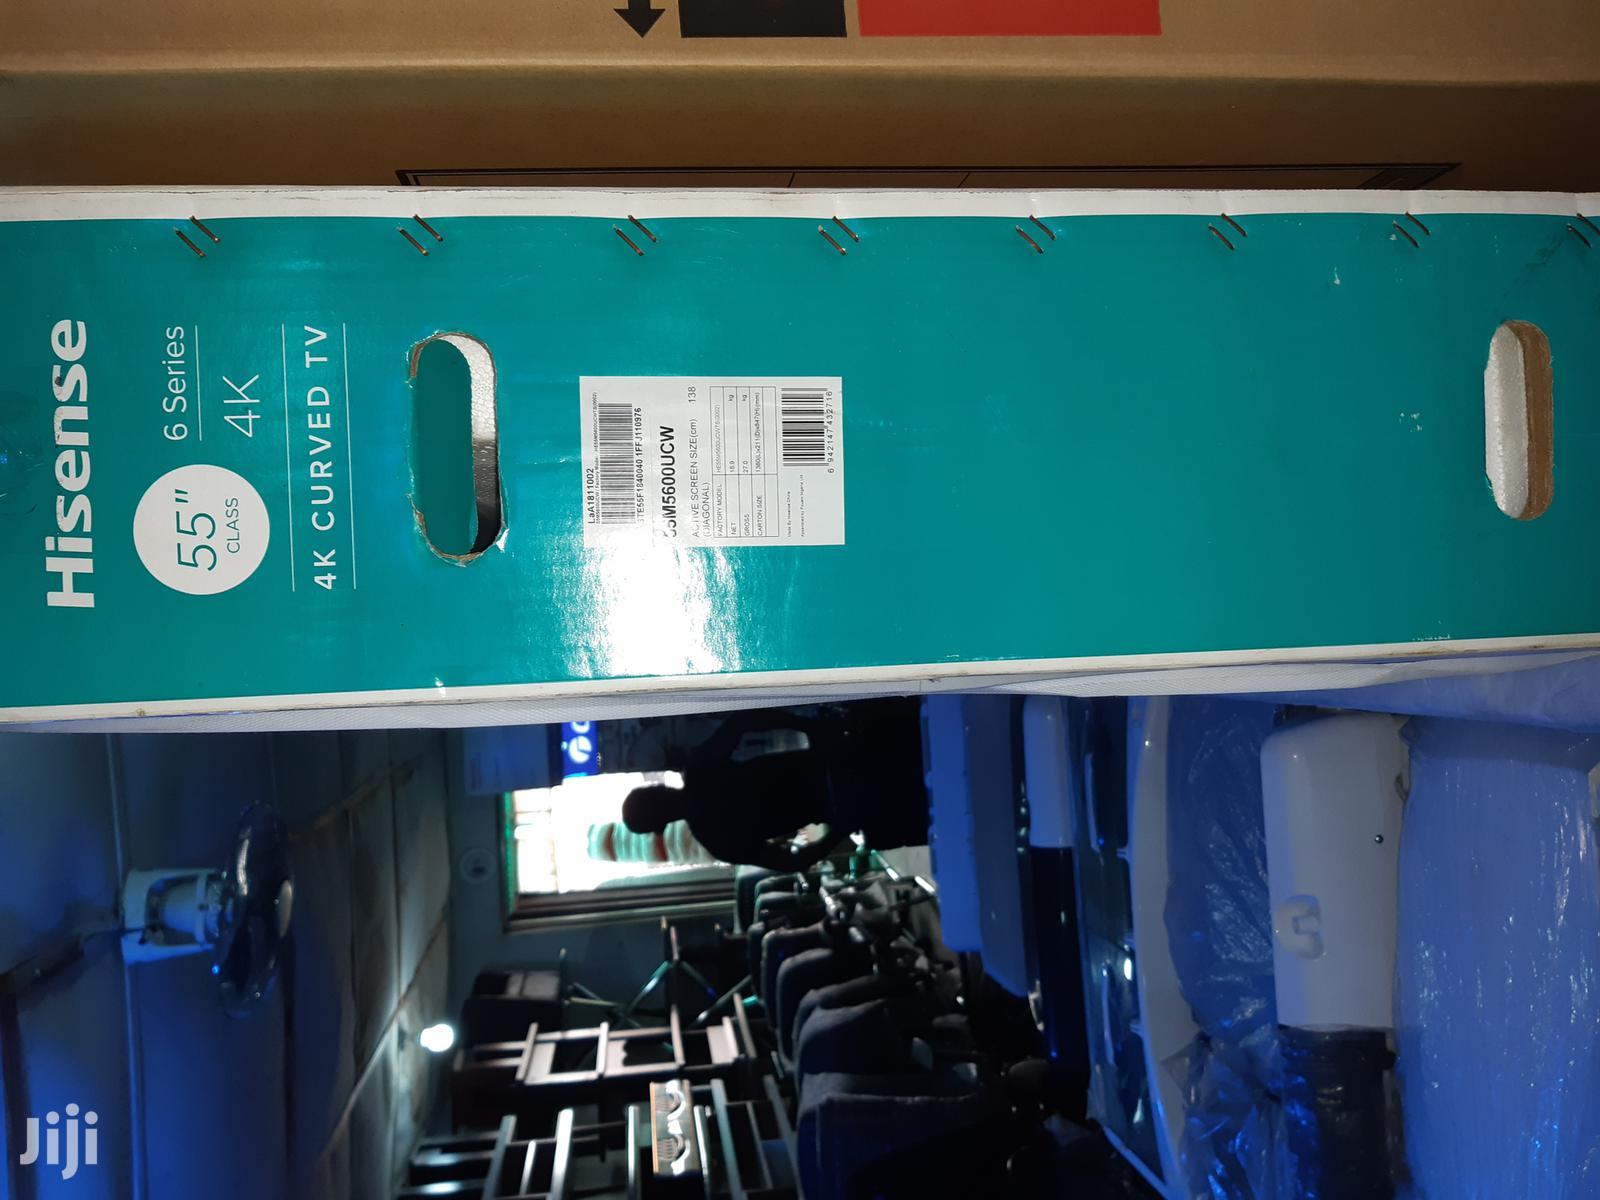 Hisense Culv Led (4K Uhd) (Youtube) TV 55 Inches | TV & DVD Equipment for sale in Oshodi, Lagos State, Nigeria